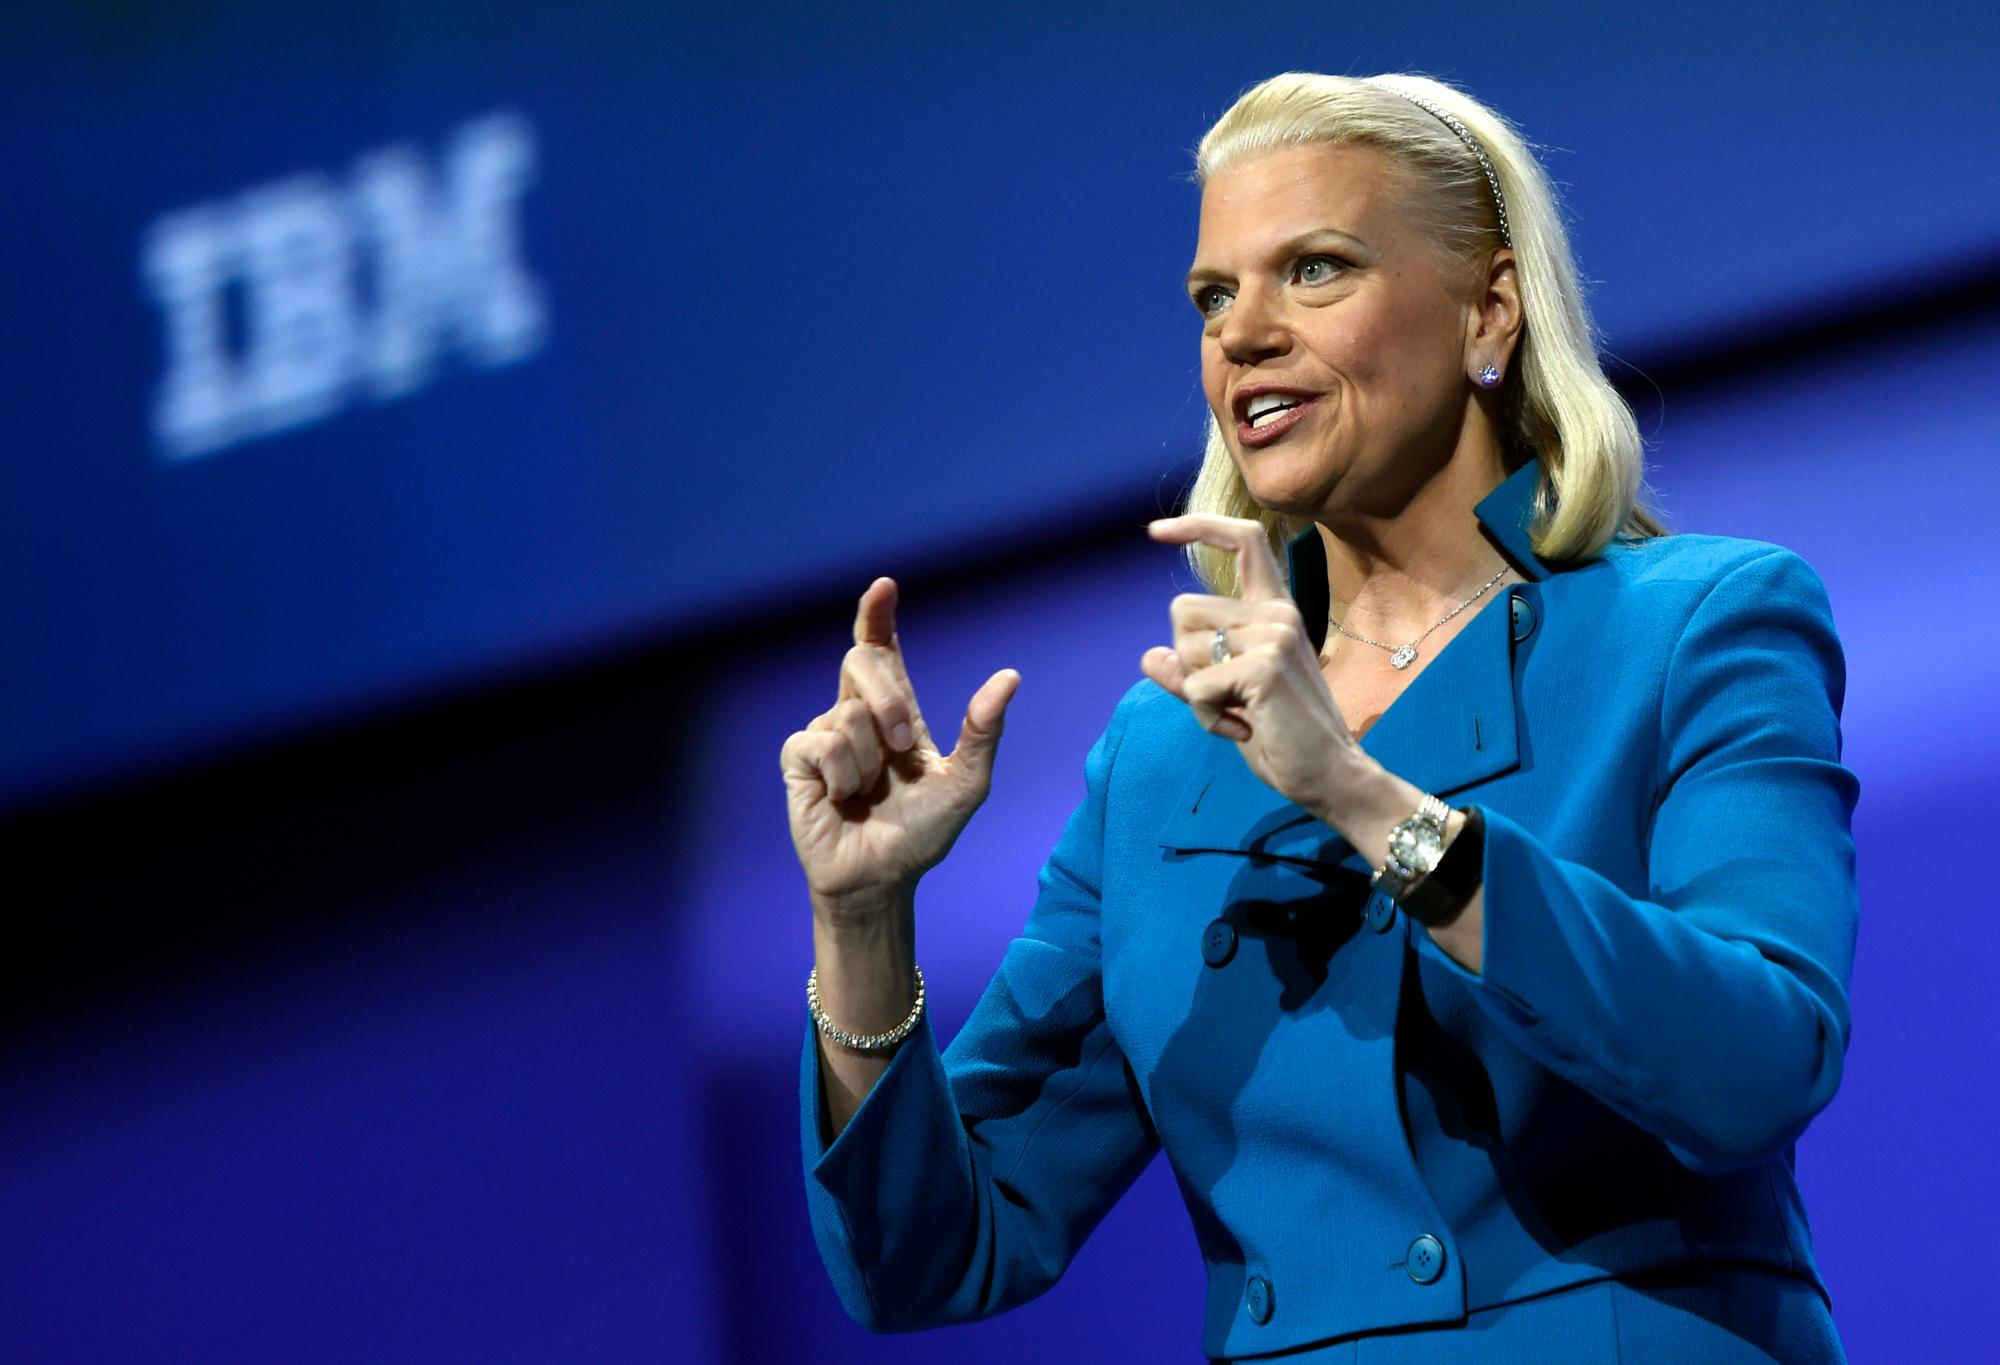 IBM CEO薪酬3300万美元 有人说远不止这个数